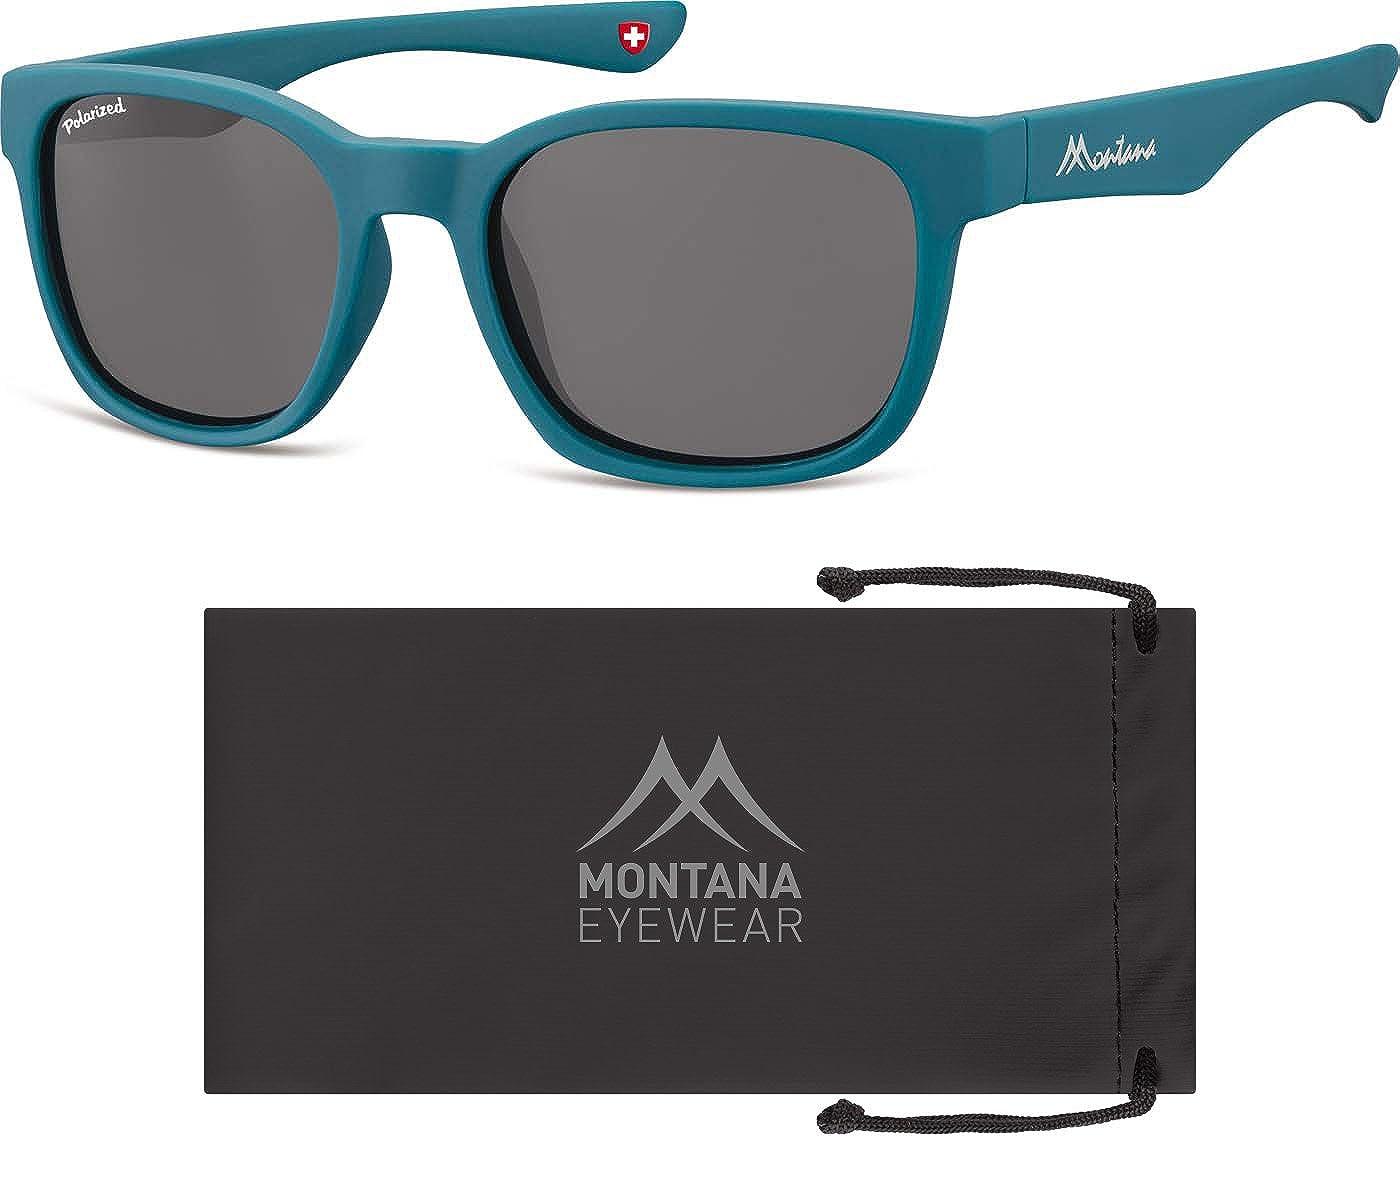 Montana Eyewear Sunoptic MP30D Sonnenbrille in petrol, inklusive Stoffbeutel